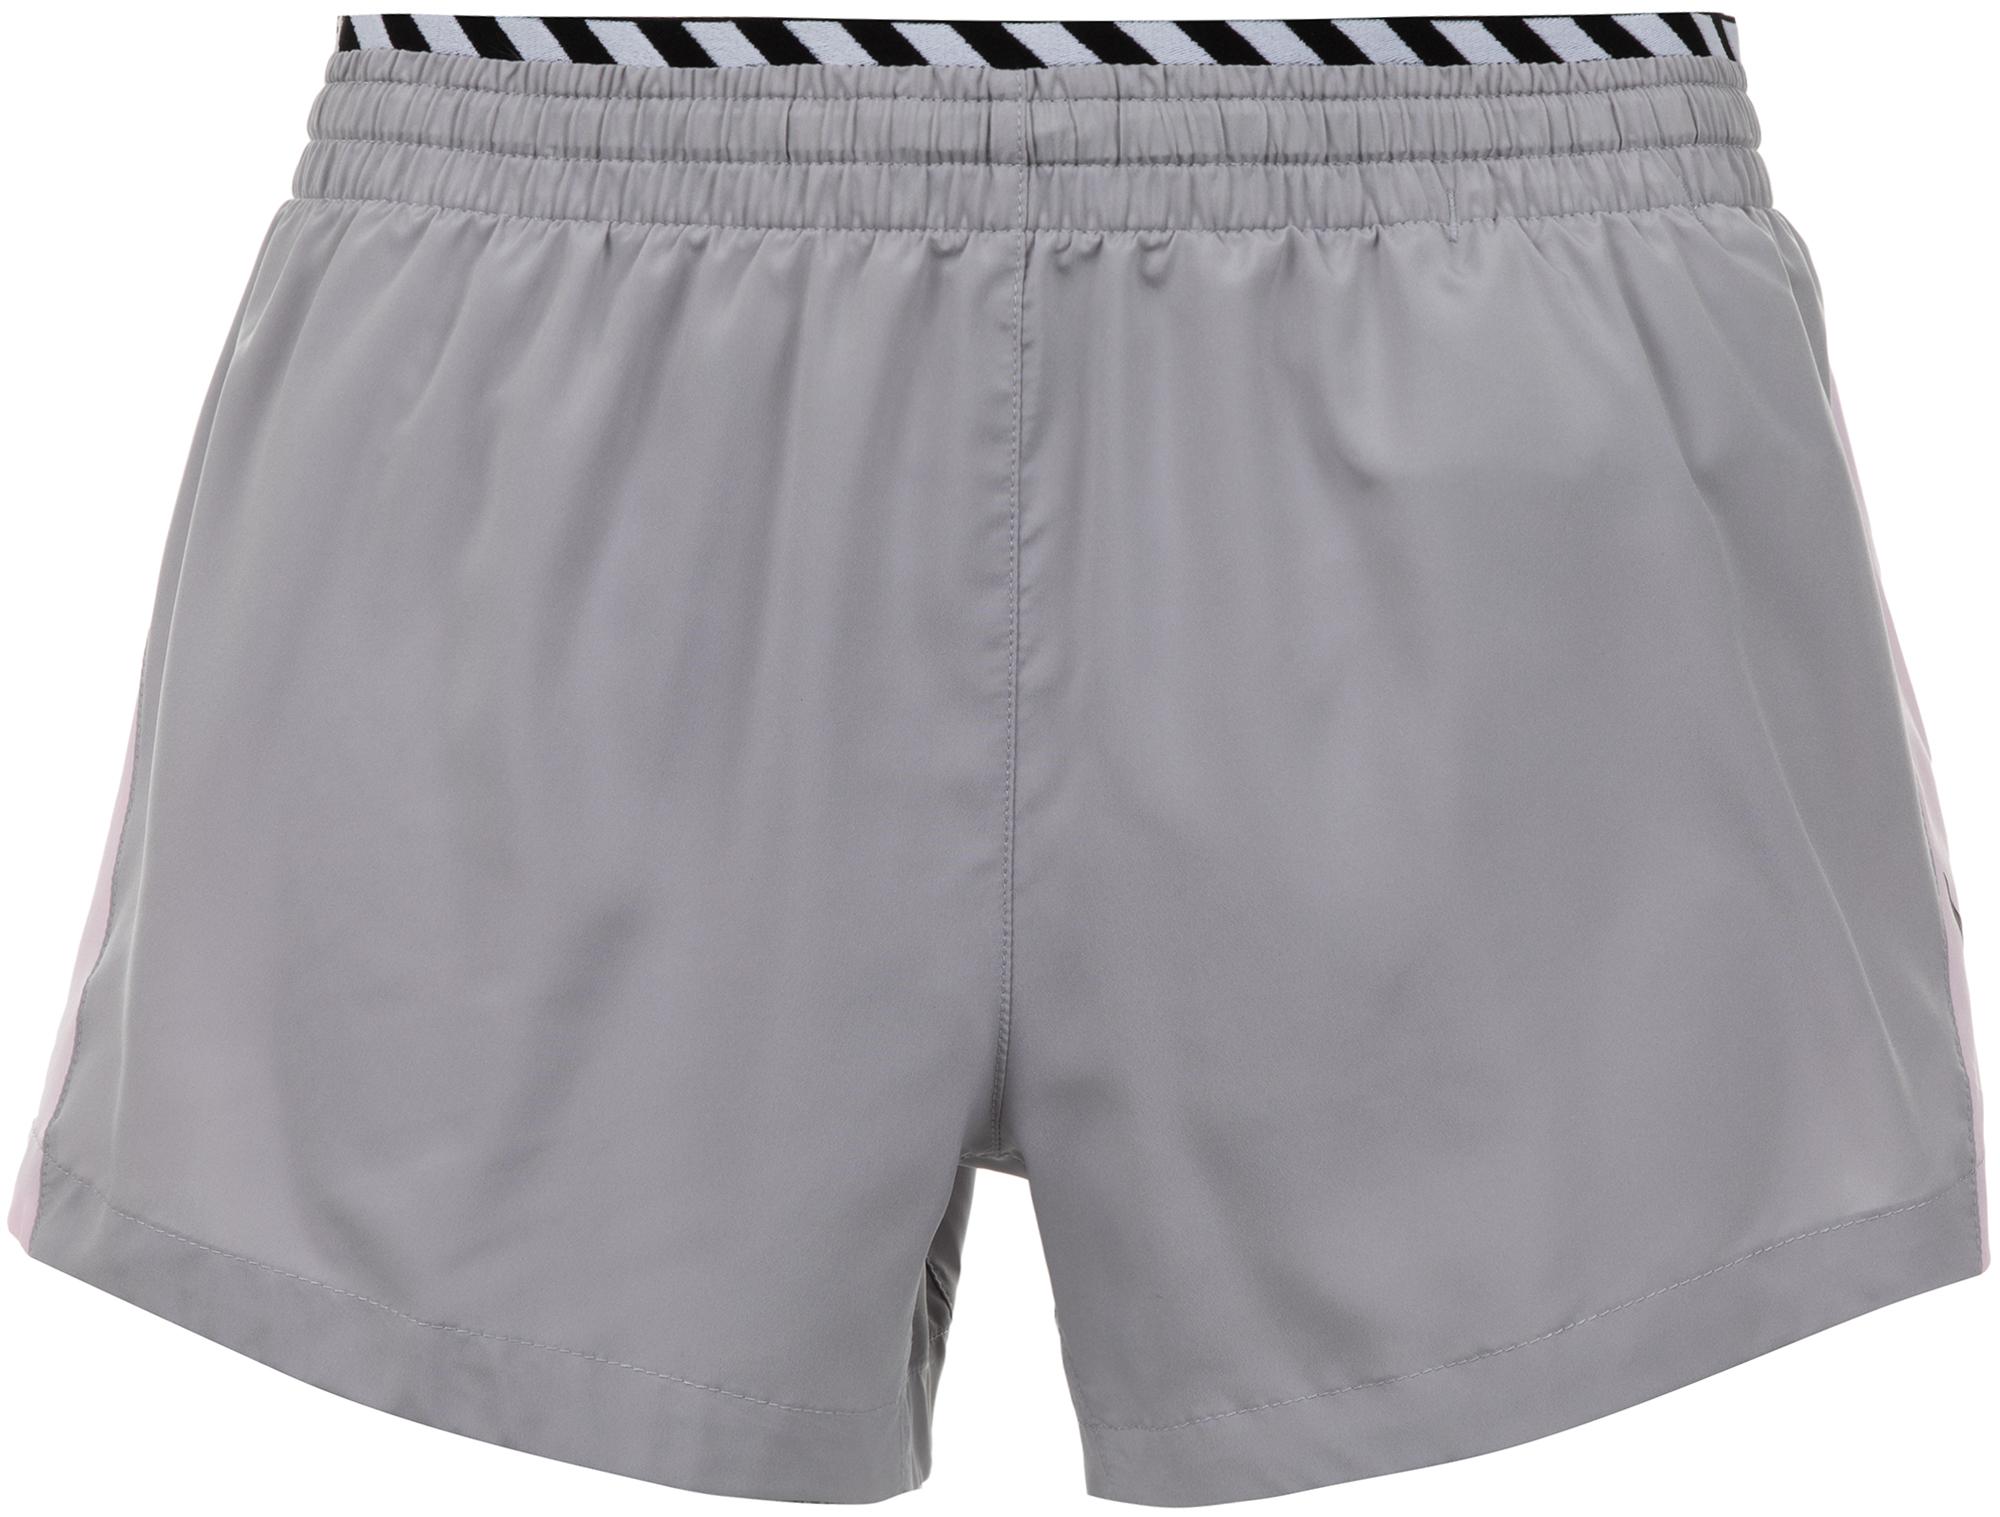 Nike Шорты женские Elevate, размер 46-48